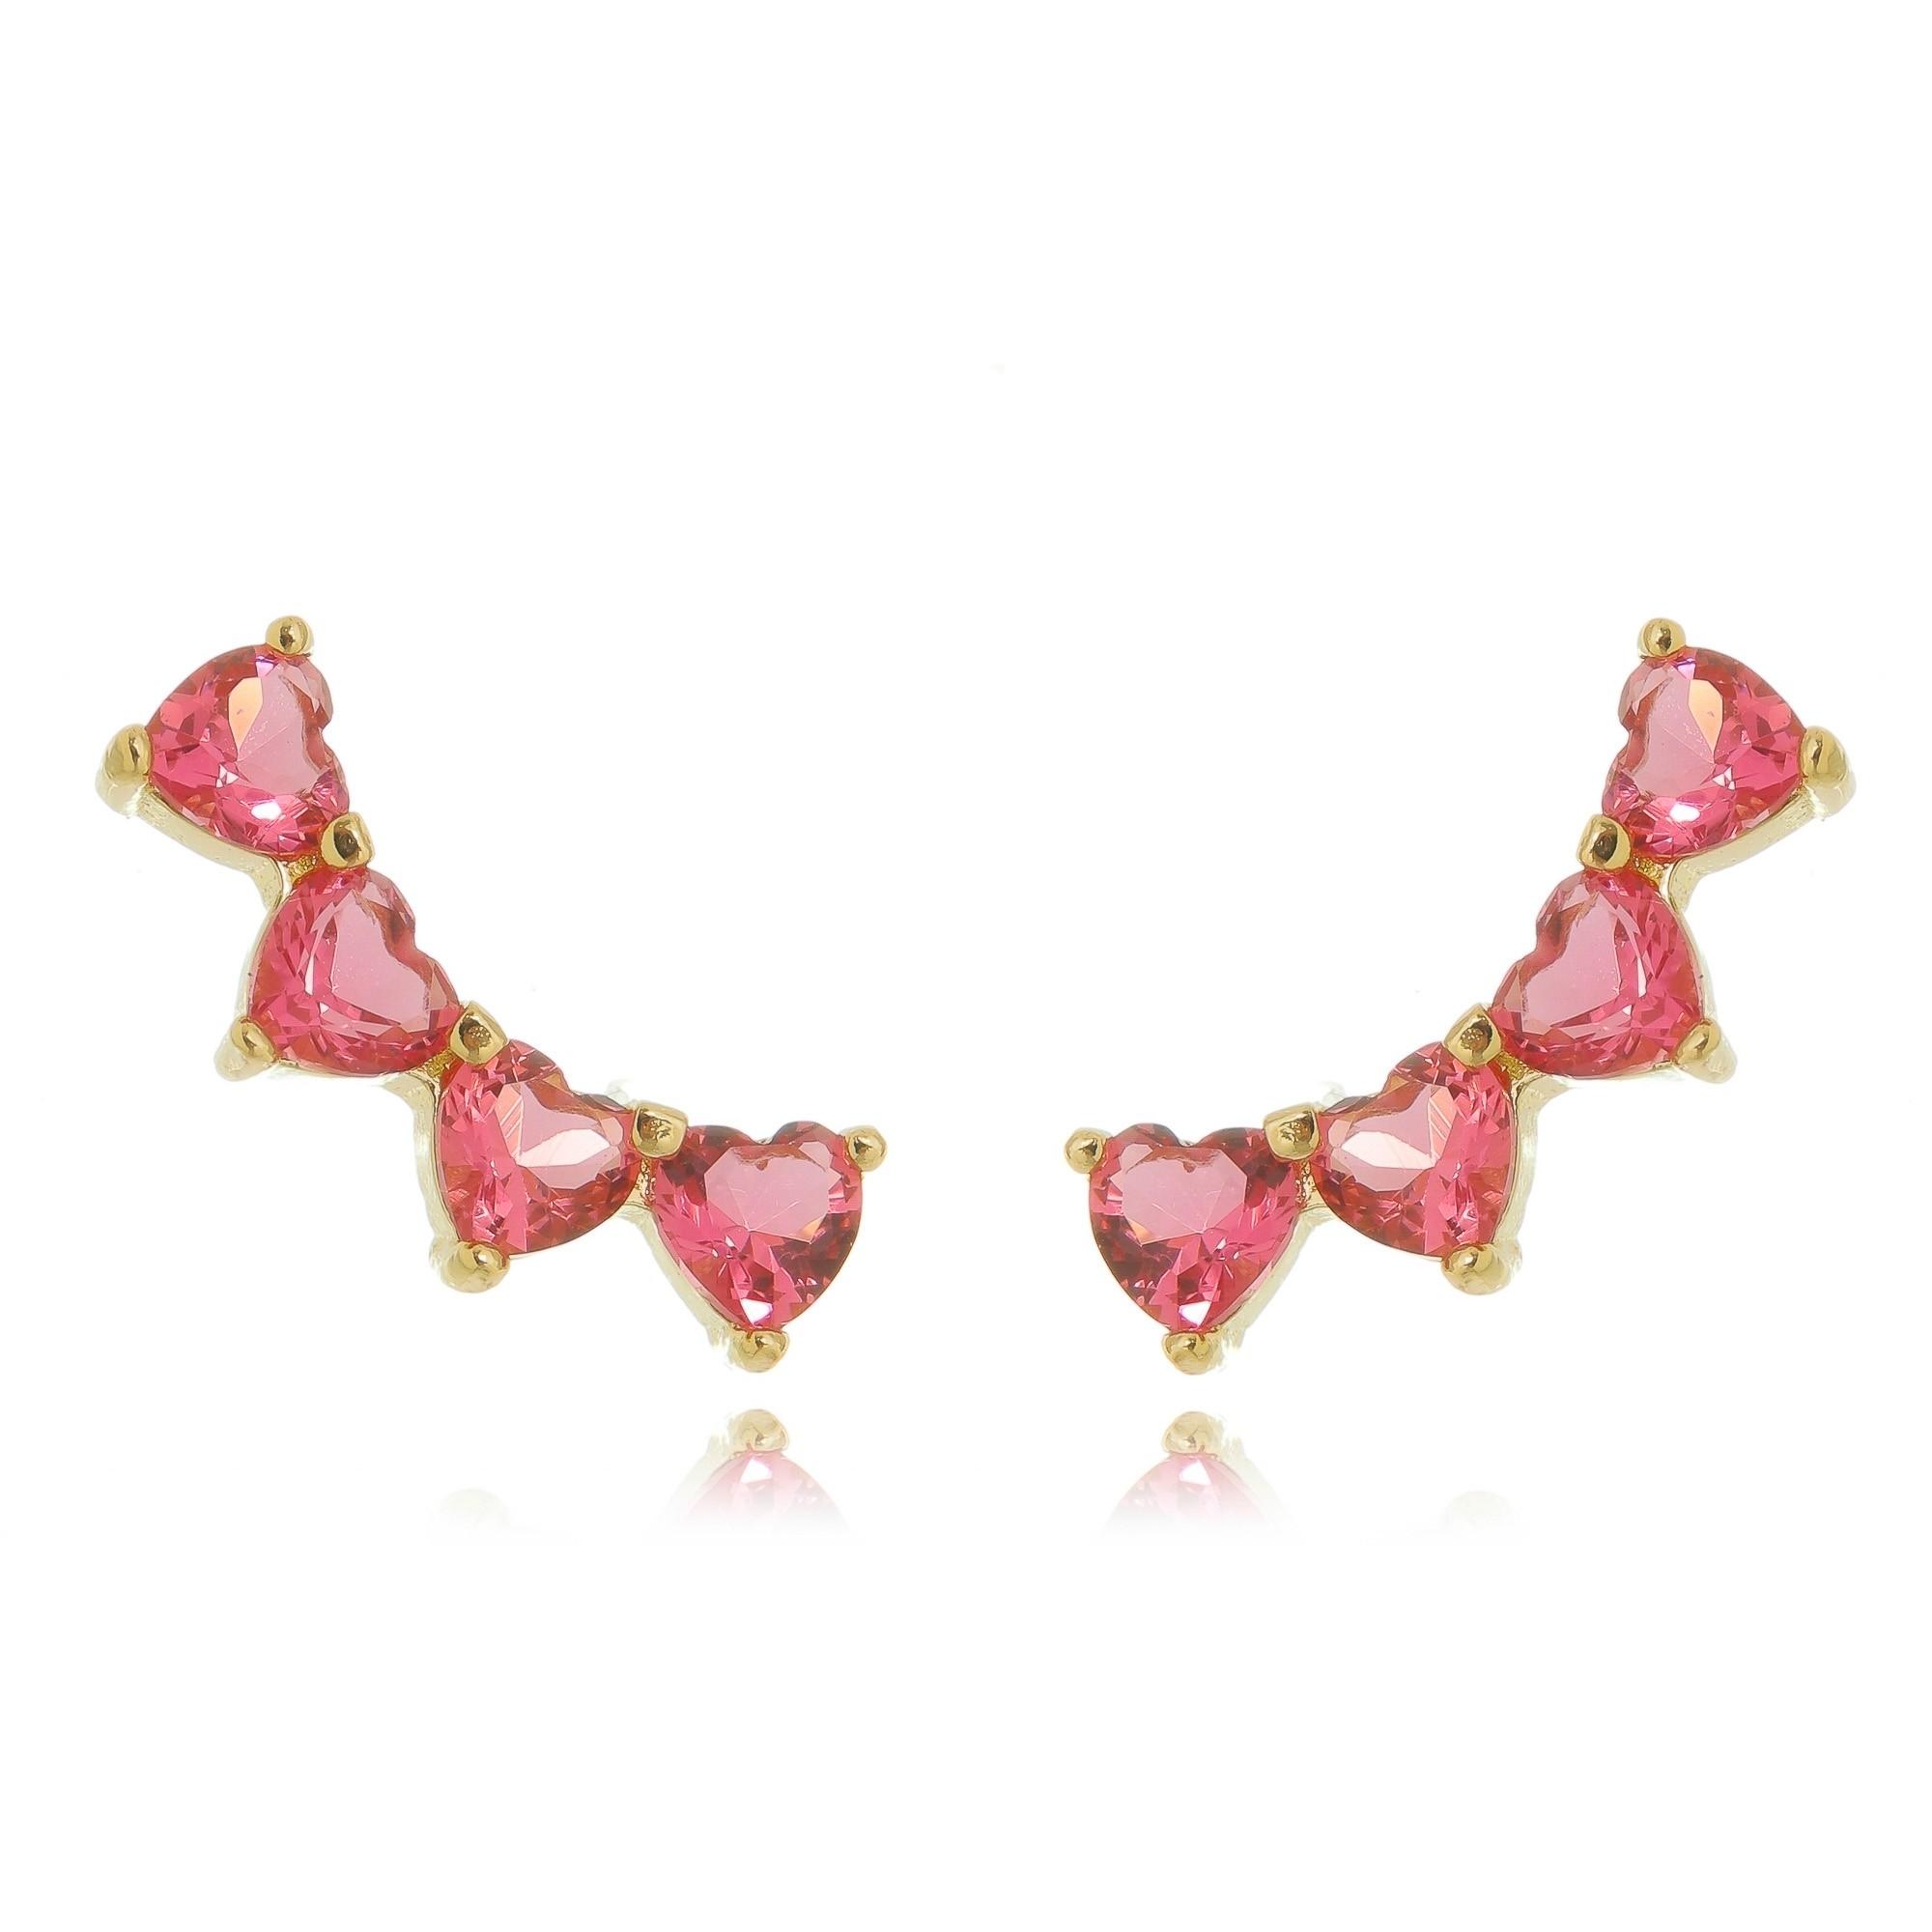 Ear Cuff Segundo Furo Corações Rosa Pink Semijoia em Ouro 18K  - Soloyou